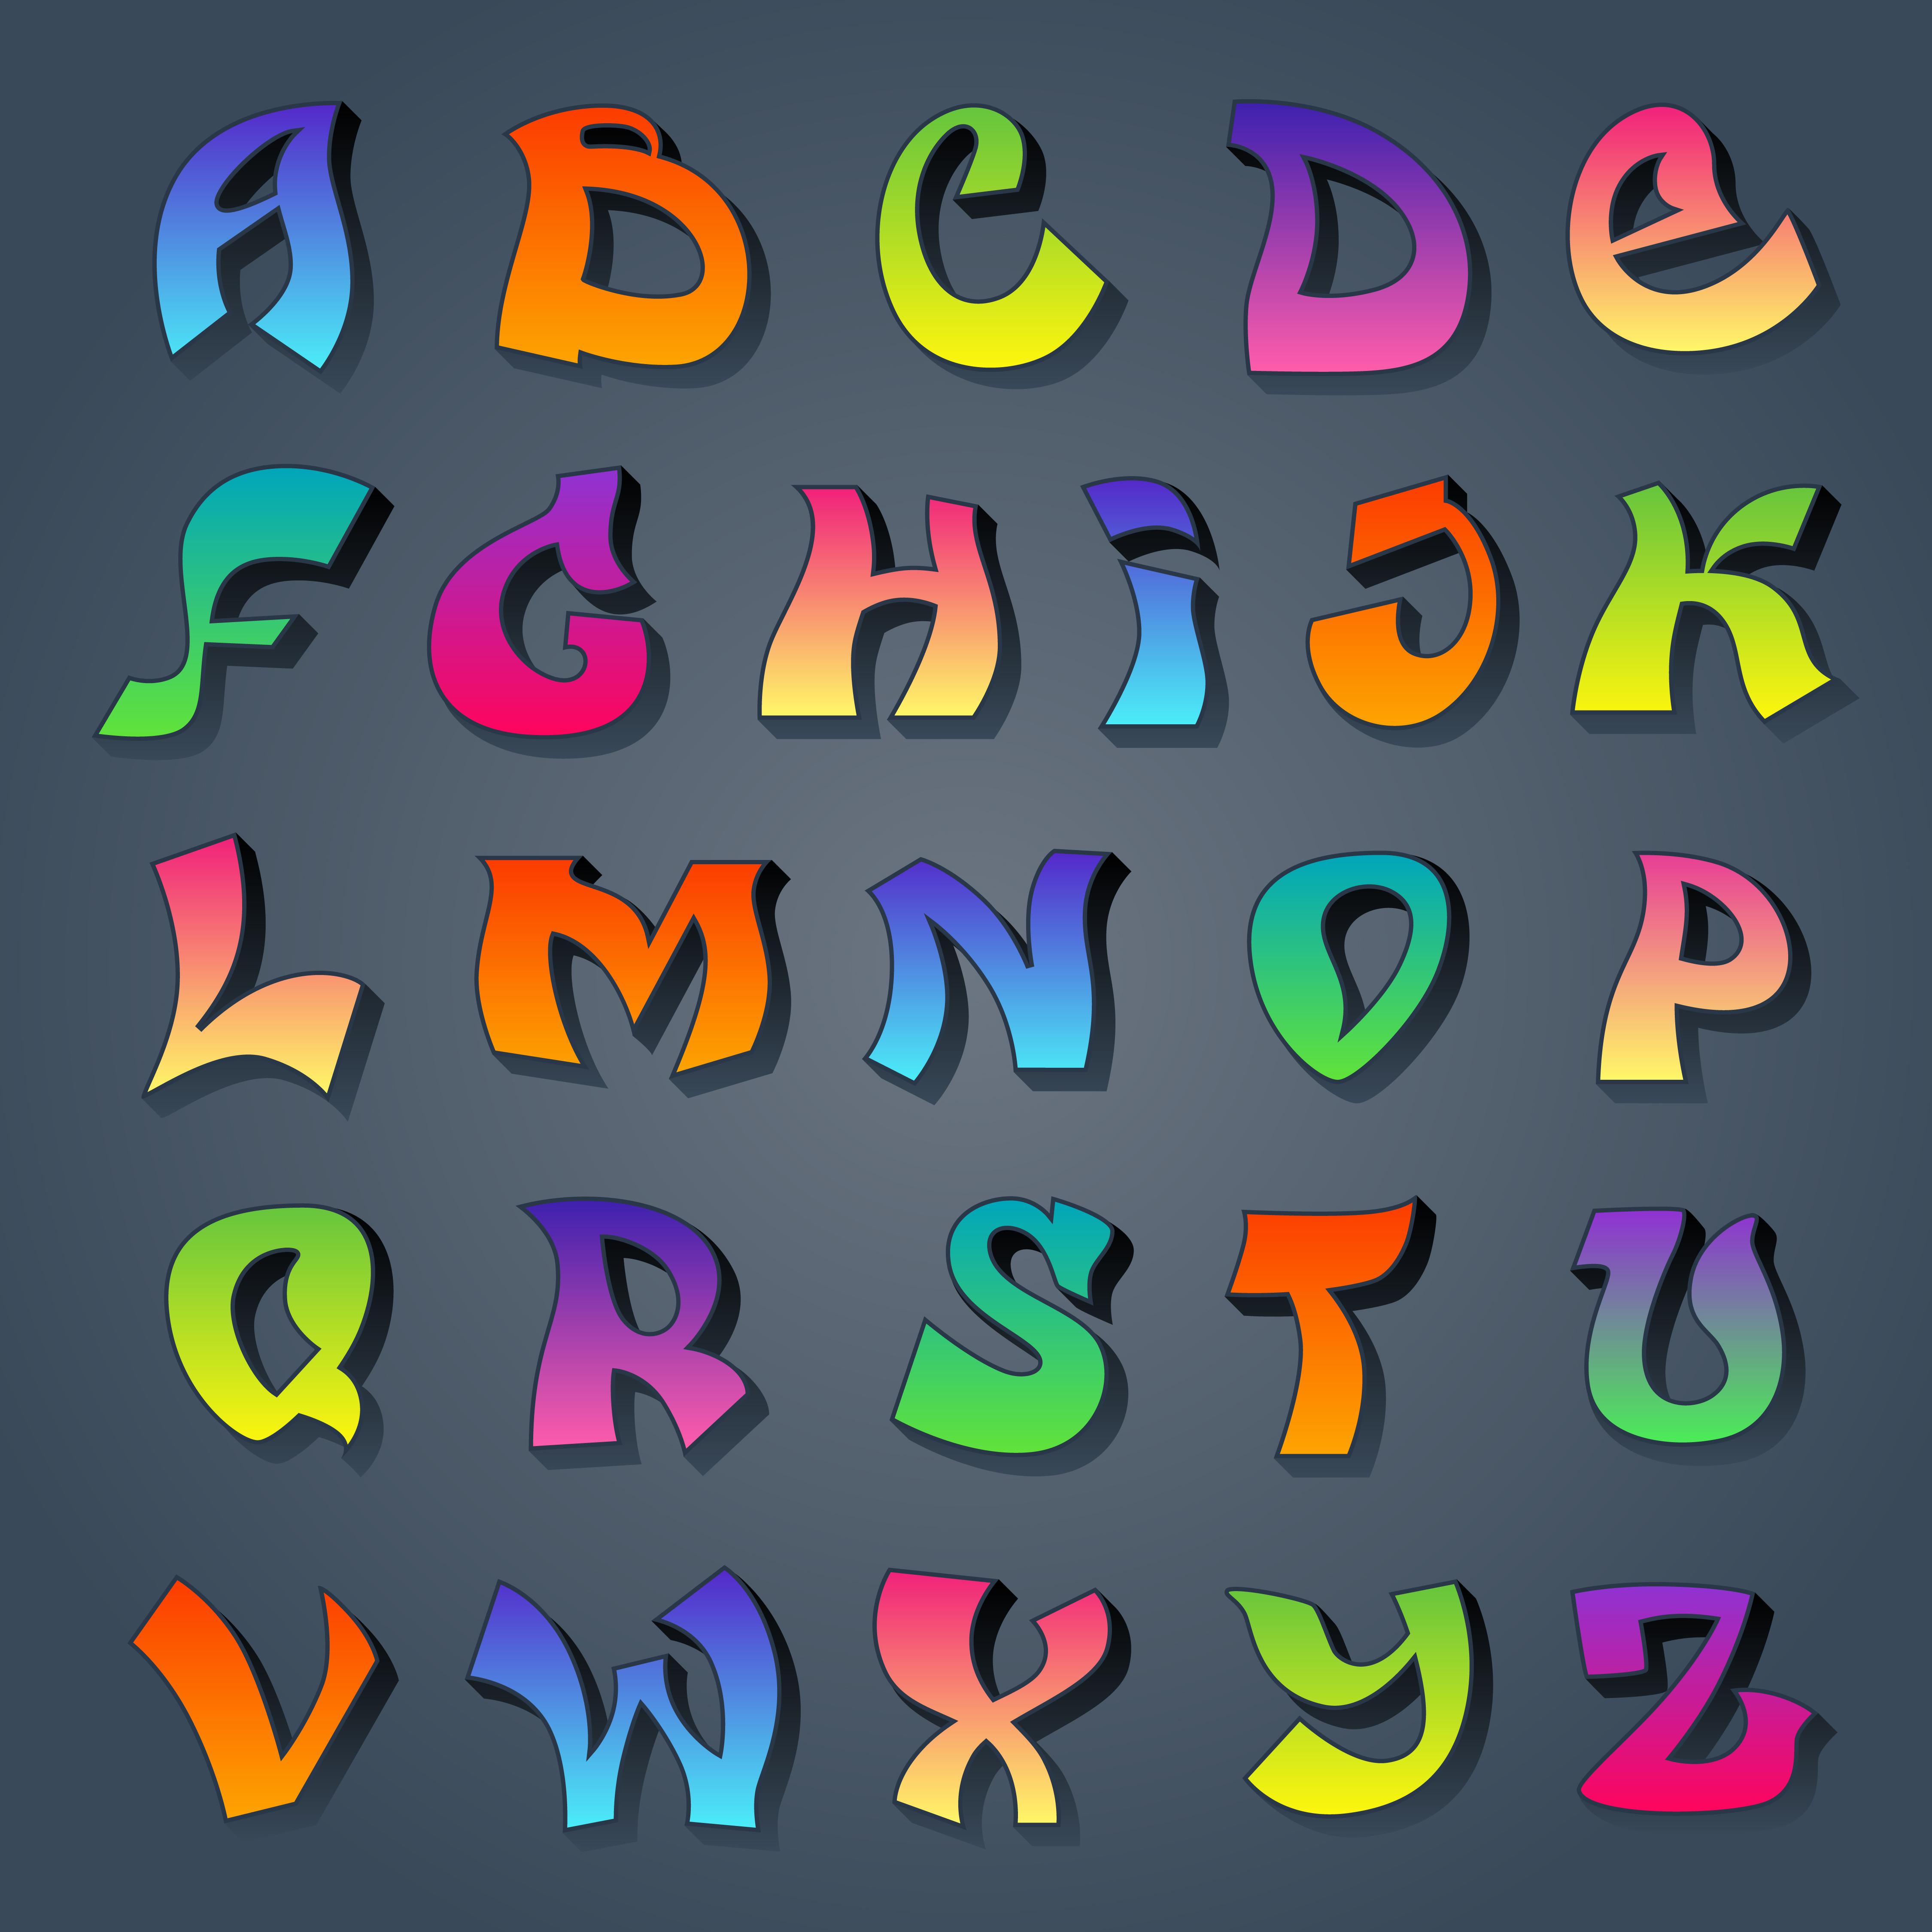 Graffiti alphabet colored - Download Free Vectors, Clipart ...